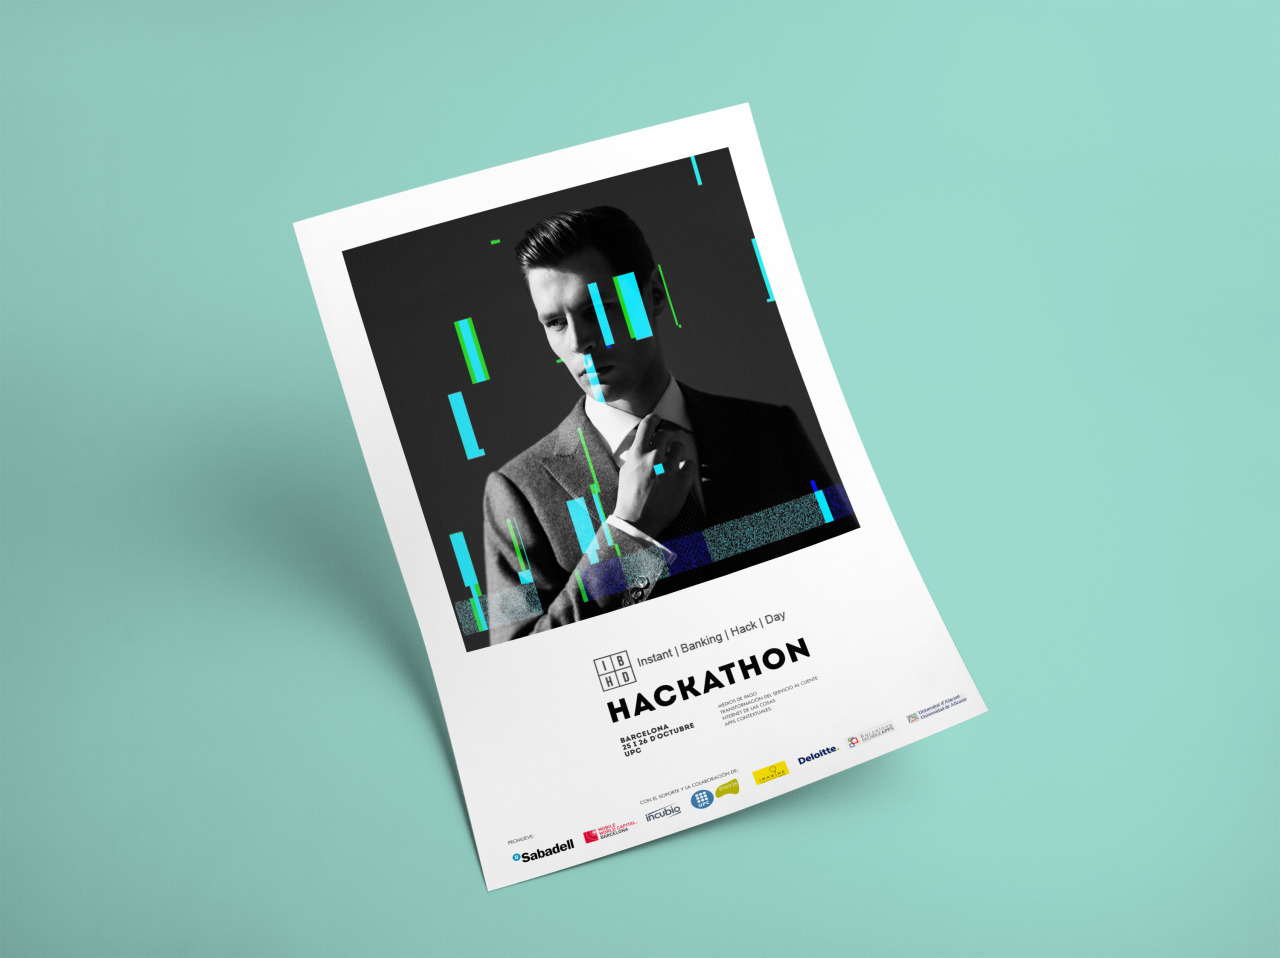 IHBD · Hackathon